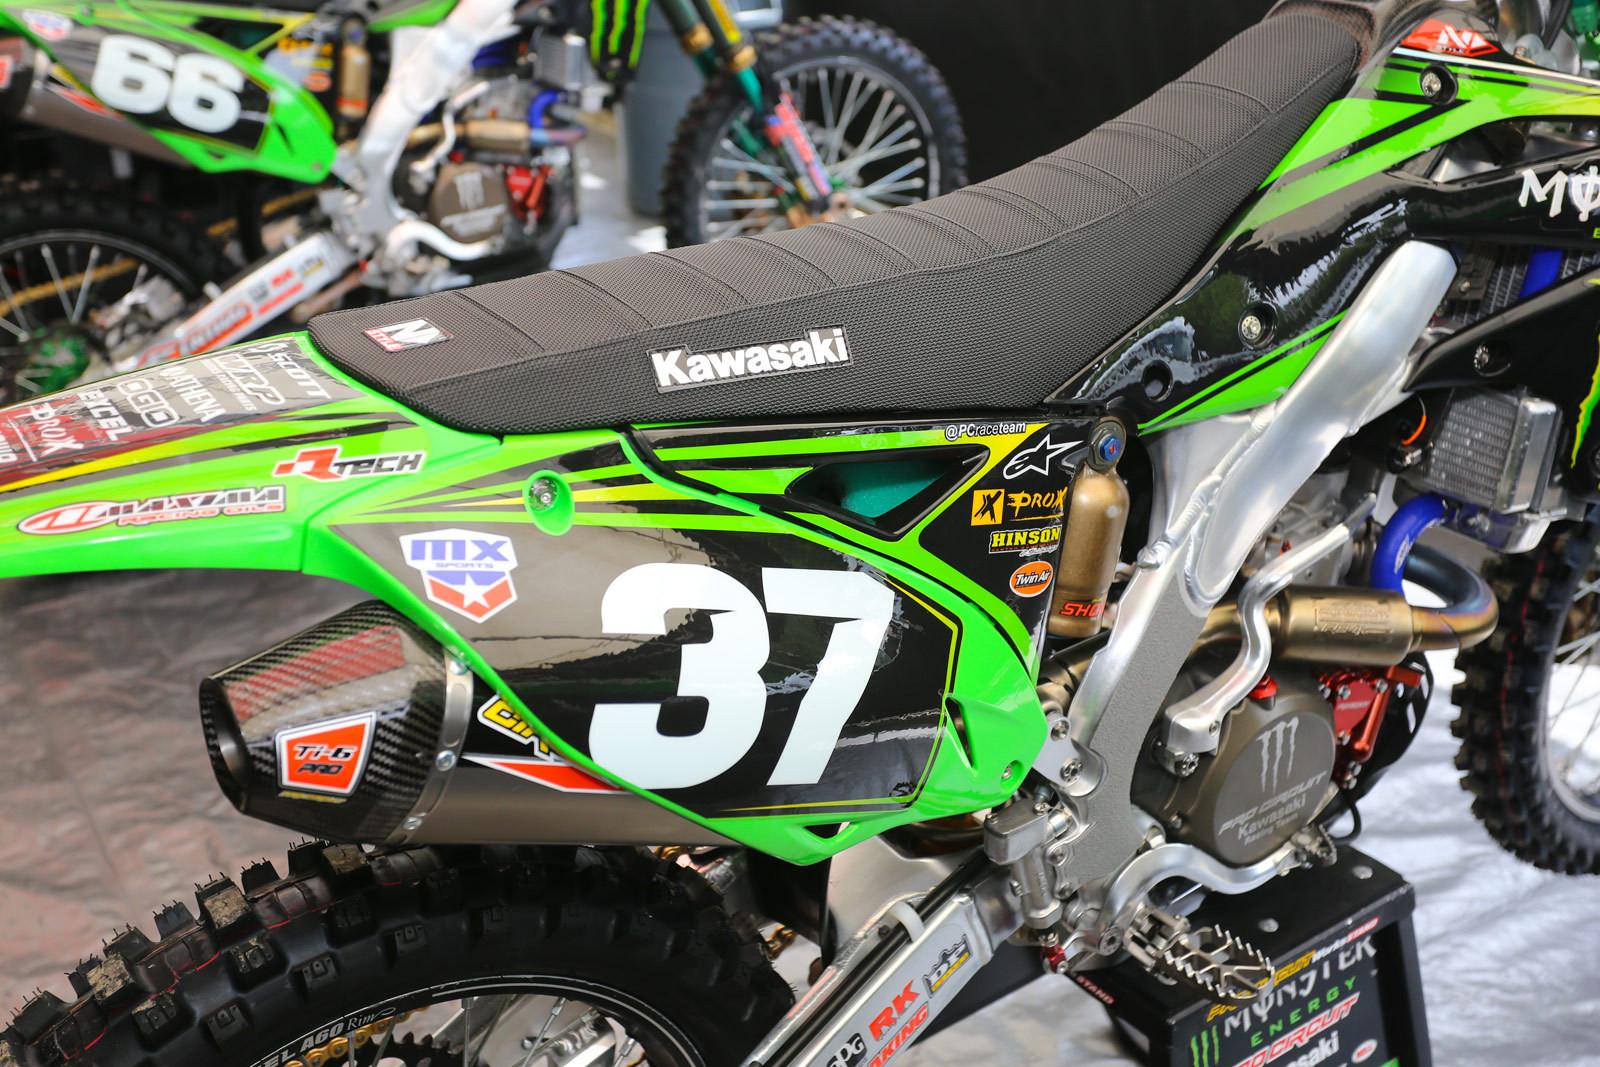 Monster Energy Pro Circuit Kawasaki - Vital MX Pit Bits: Muddy Creek - Motocross Pictures - Vital MX